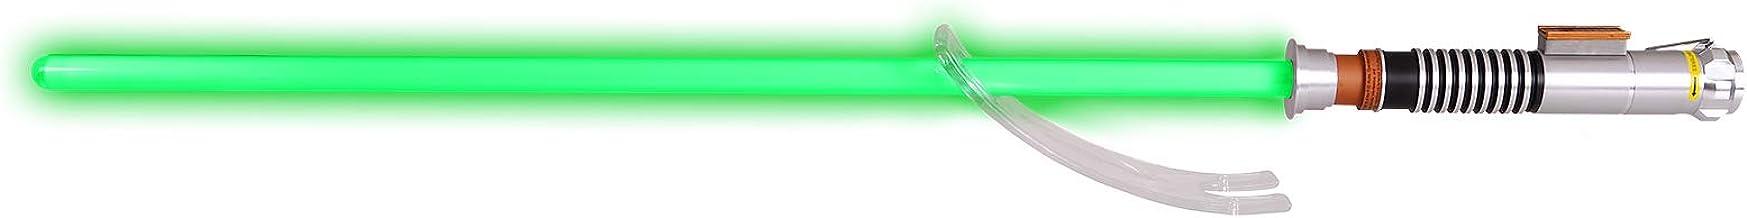 Amazon.es: espadas laser star wars